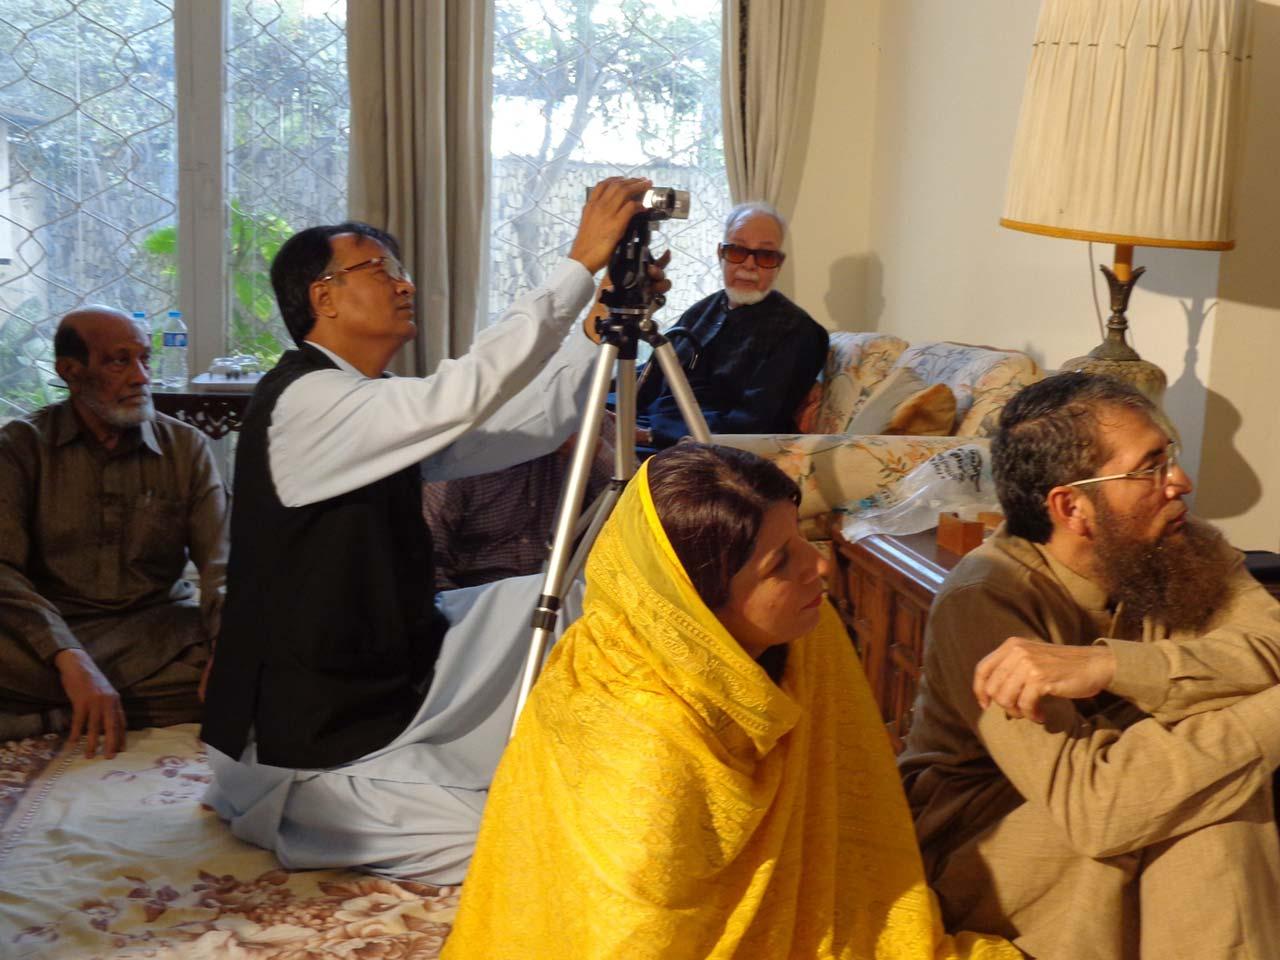 M. Ikhlaq, Wasinuddin Siddiqi and Syed Mehmood Ali, Mr & Mrs. Khalid Hasan